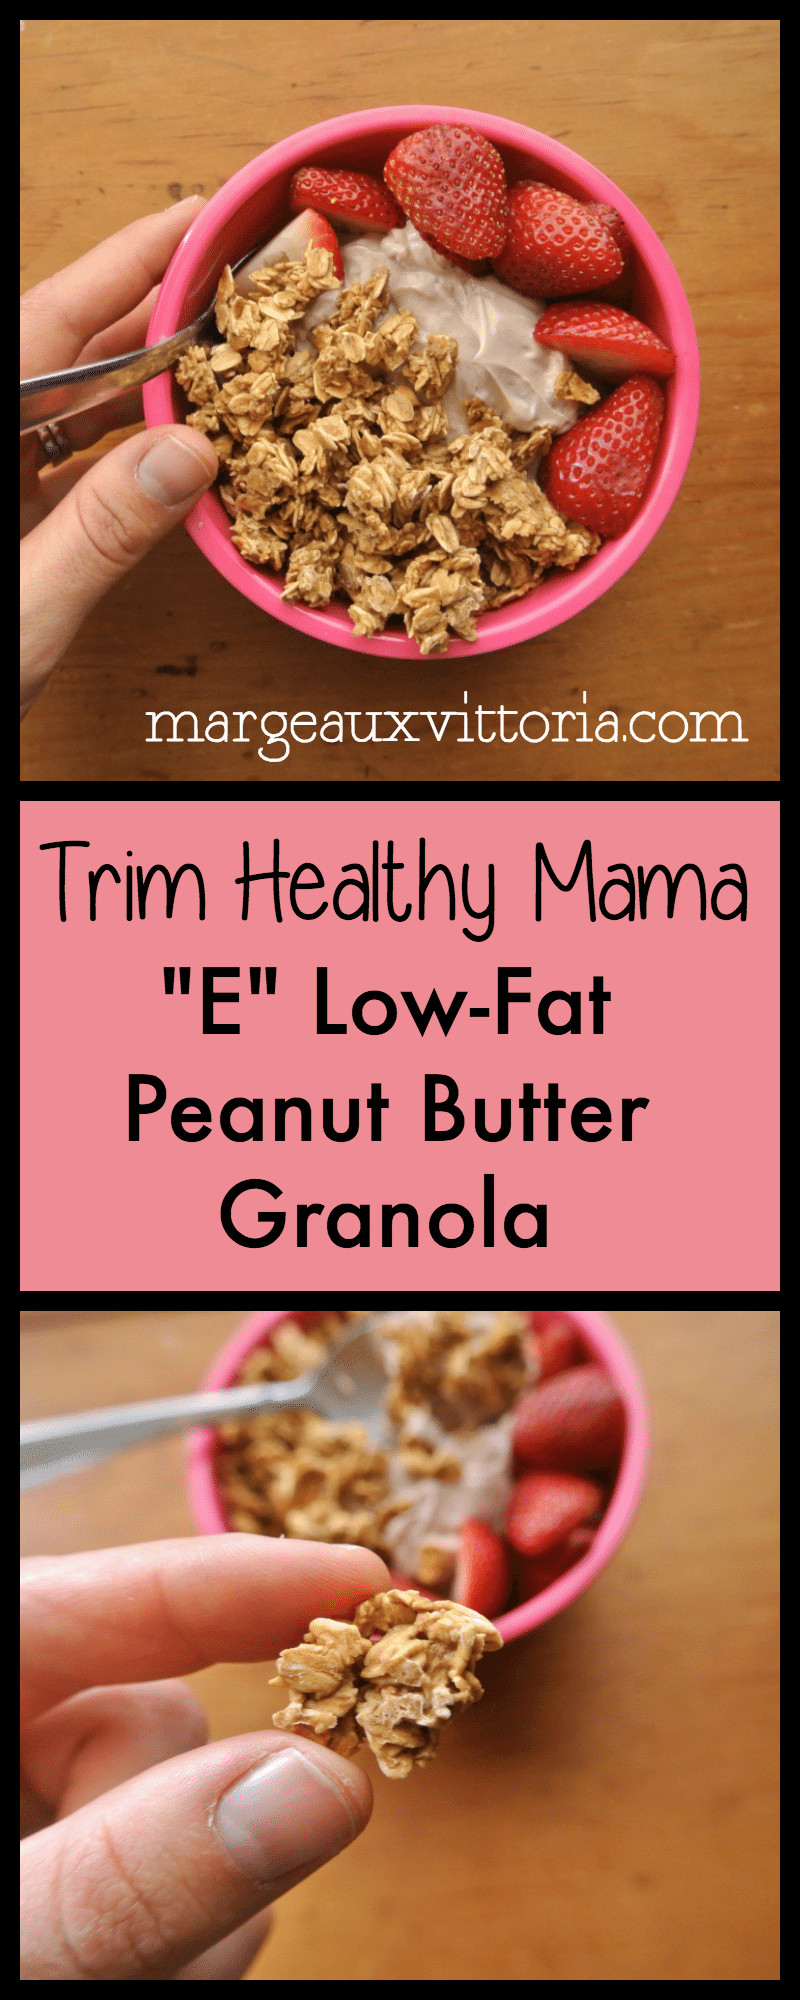 "Trim Healthy Mama Breakfast  Trim Healthy Mama ""E"" Low Fat Peanut Butter Granola"